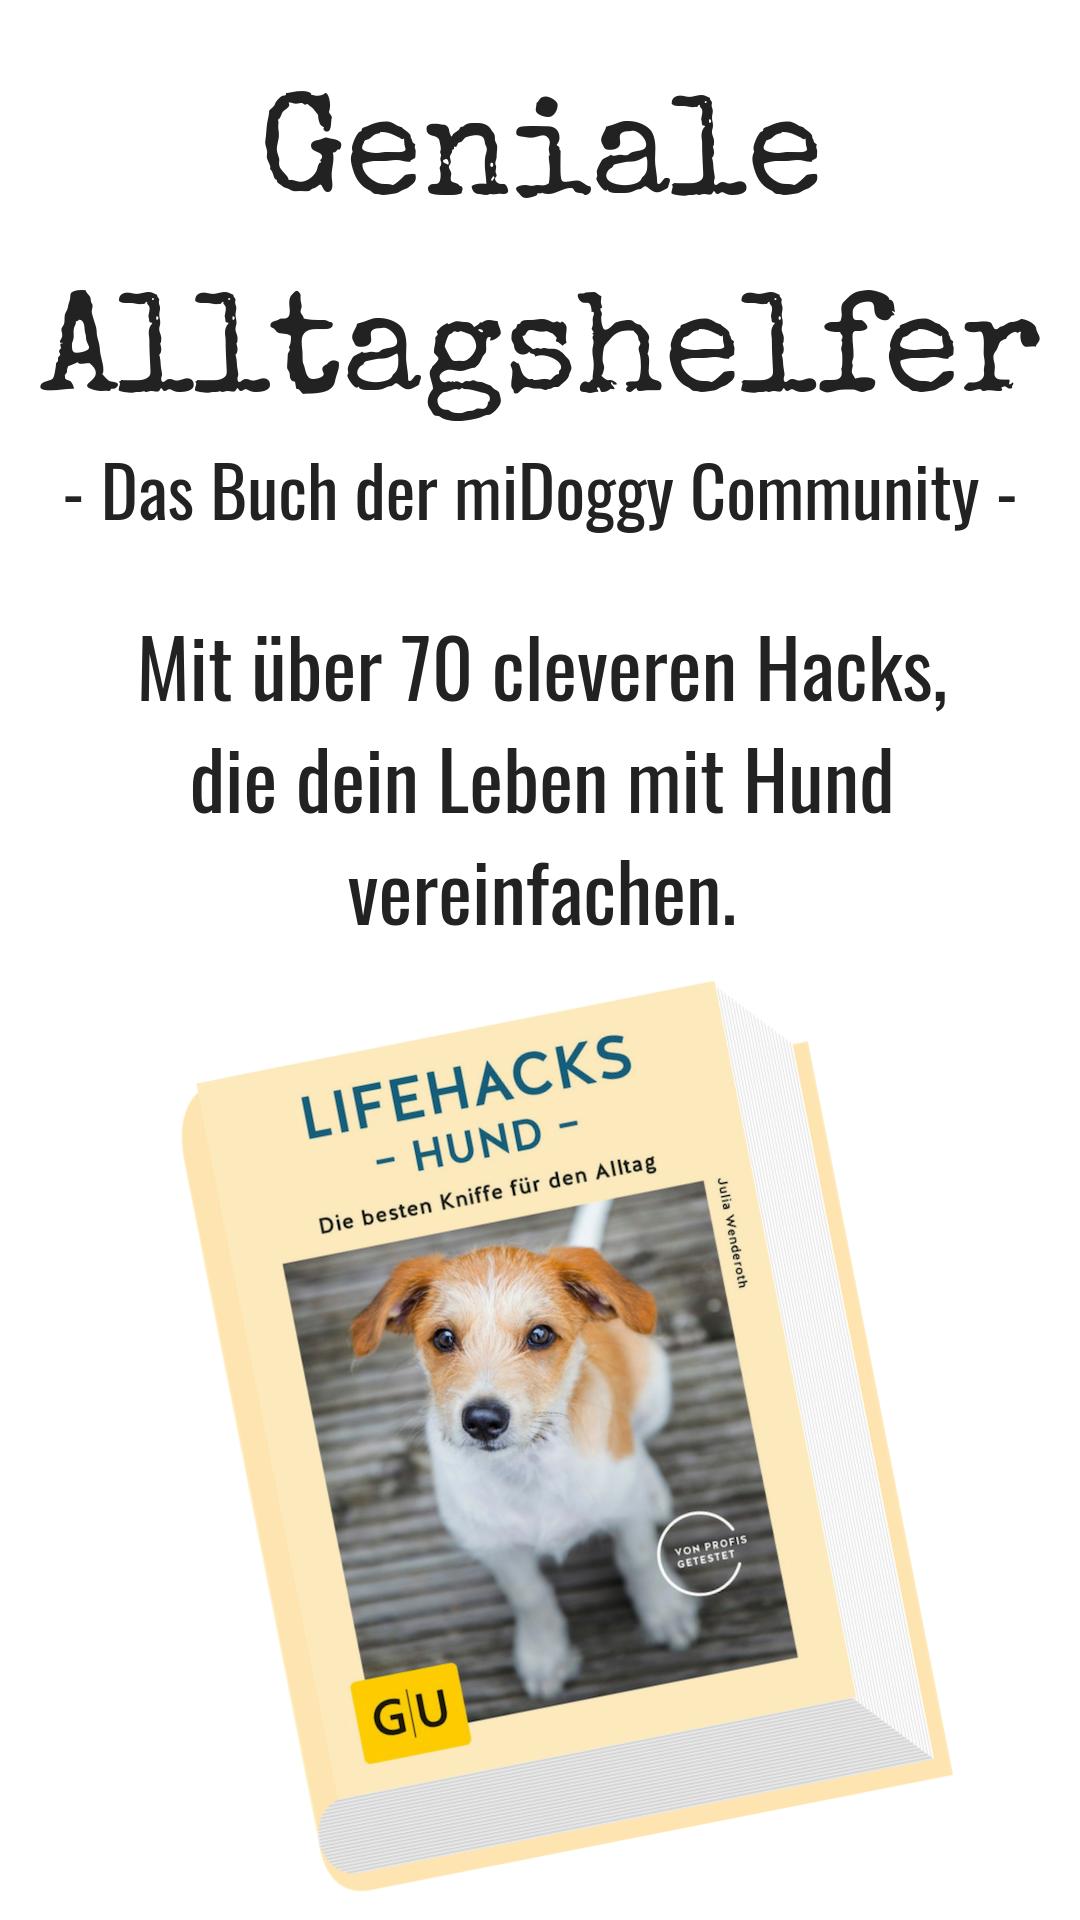 Hunde Tricks Hacks Tipps Ideen Bilder Hund Alltagshelfer Clever